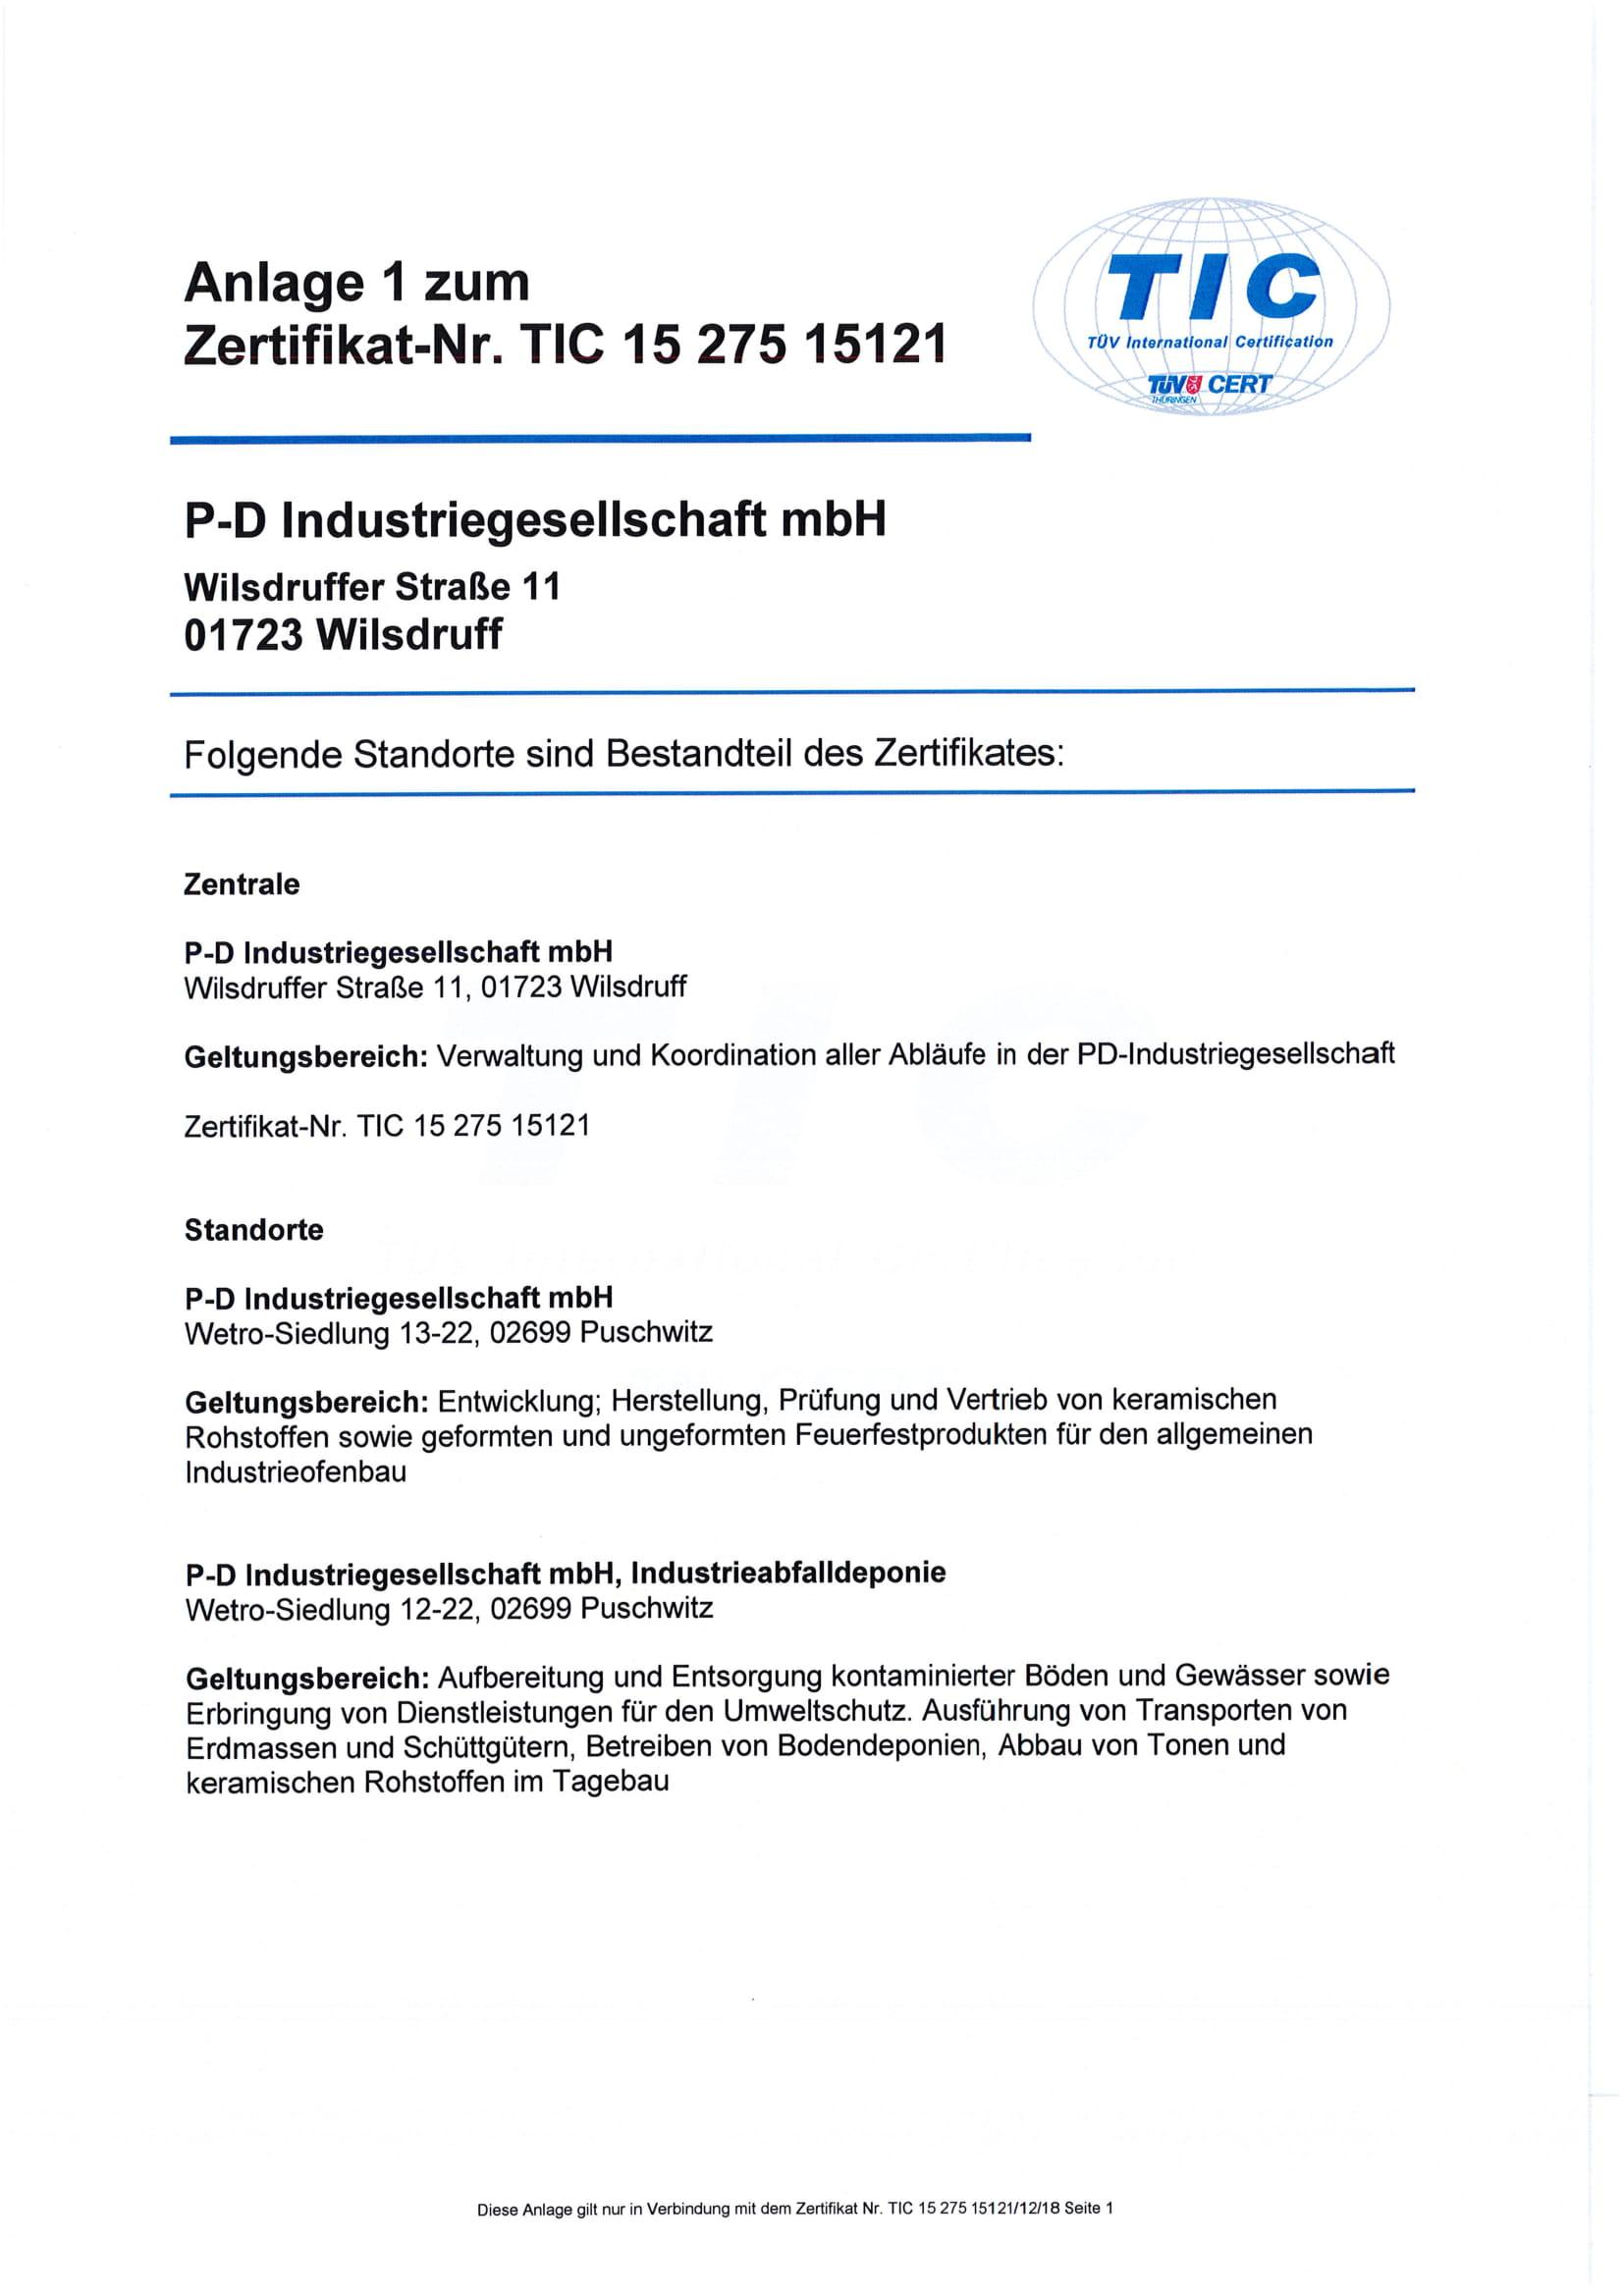 P-D Industriegesellschaft mbH · DIN EN ISO 50001:2011 (Anlage)